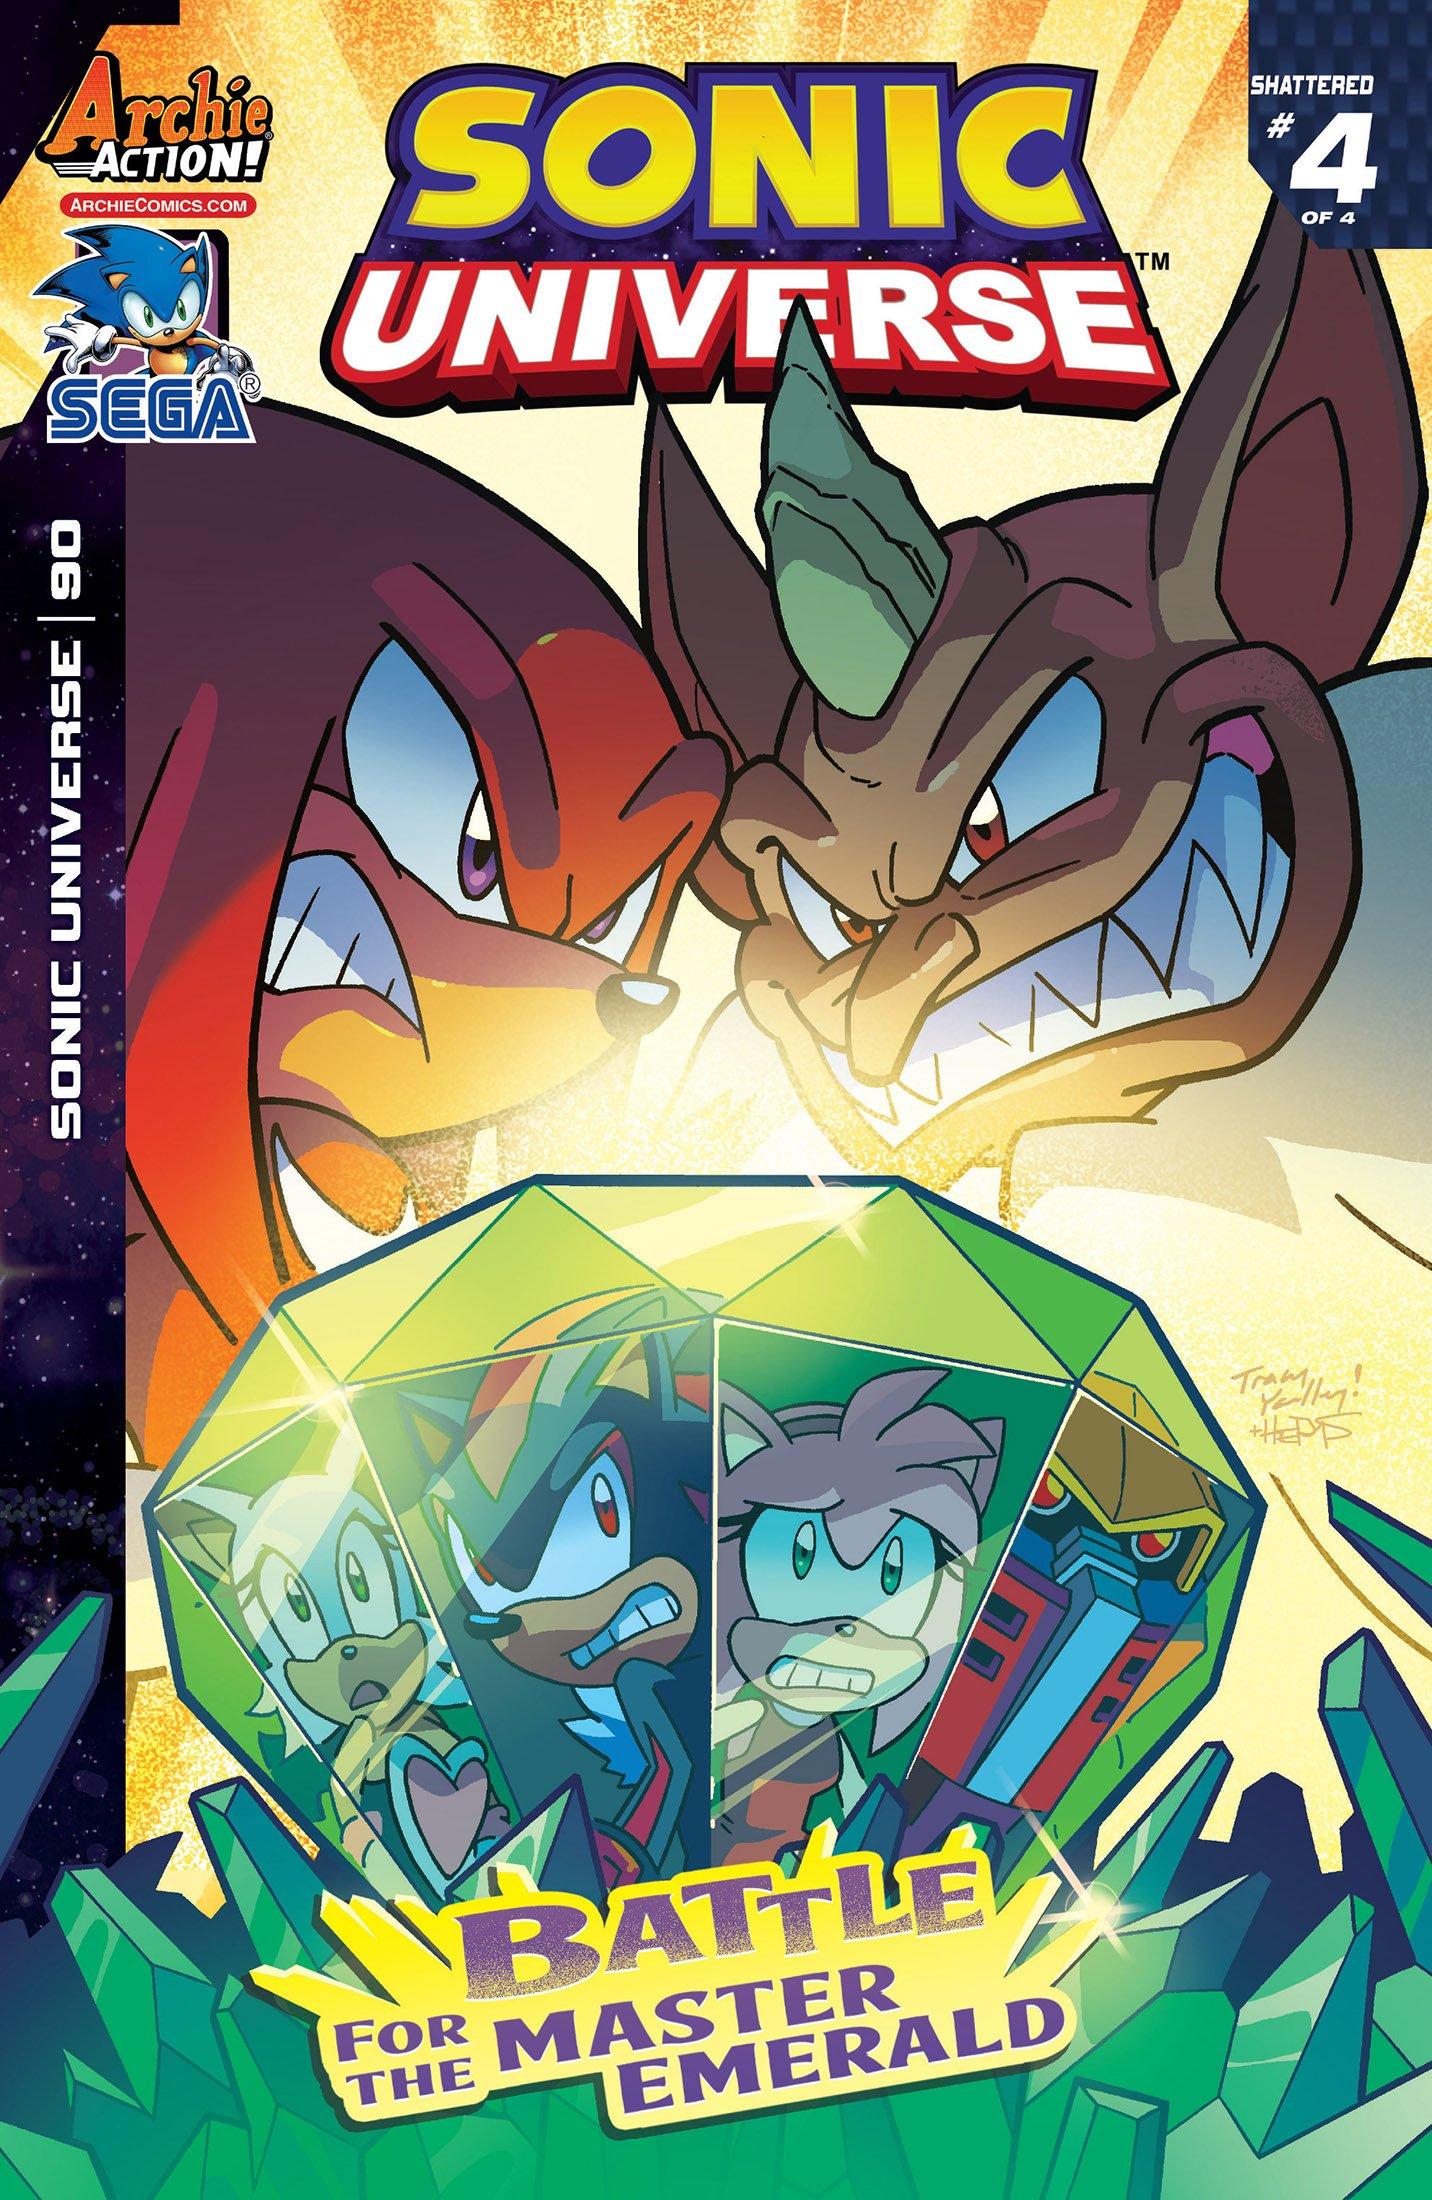 Sonic Universe 090 (November 2016)